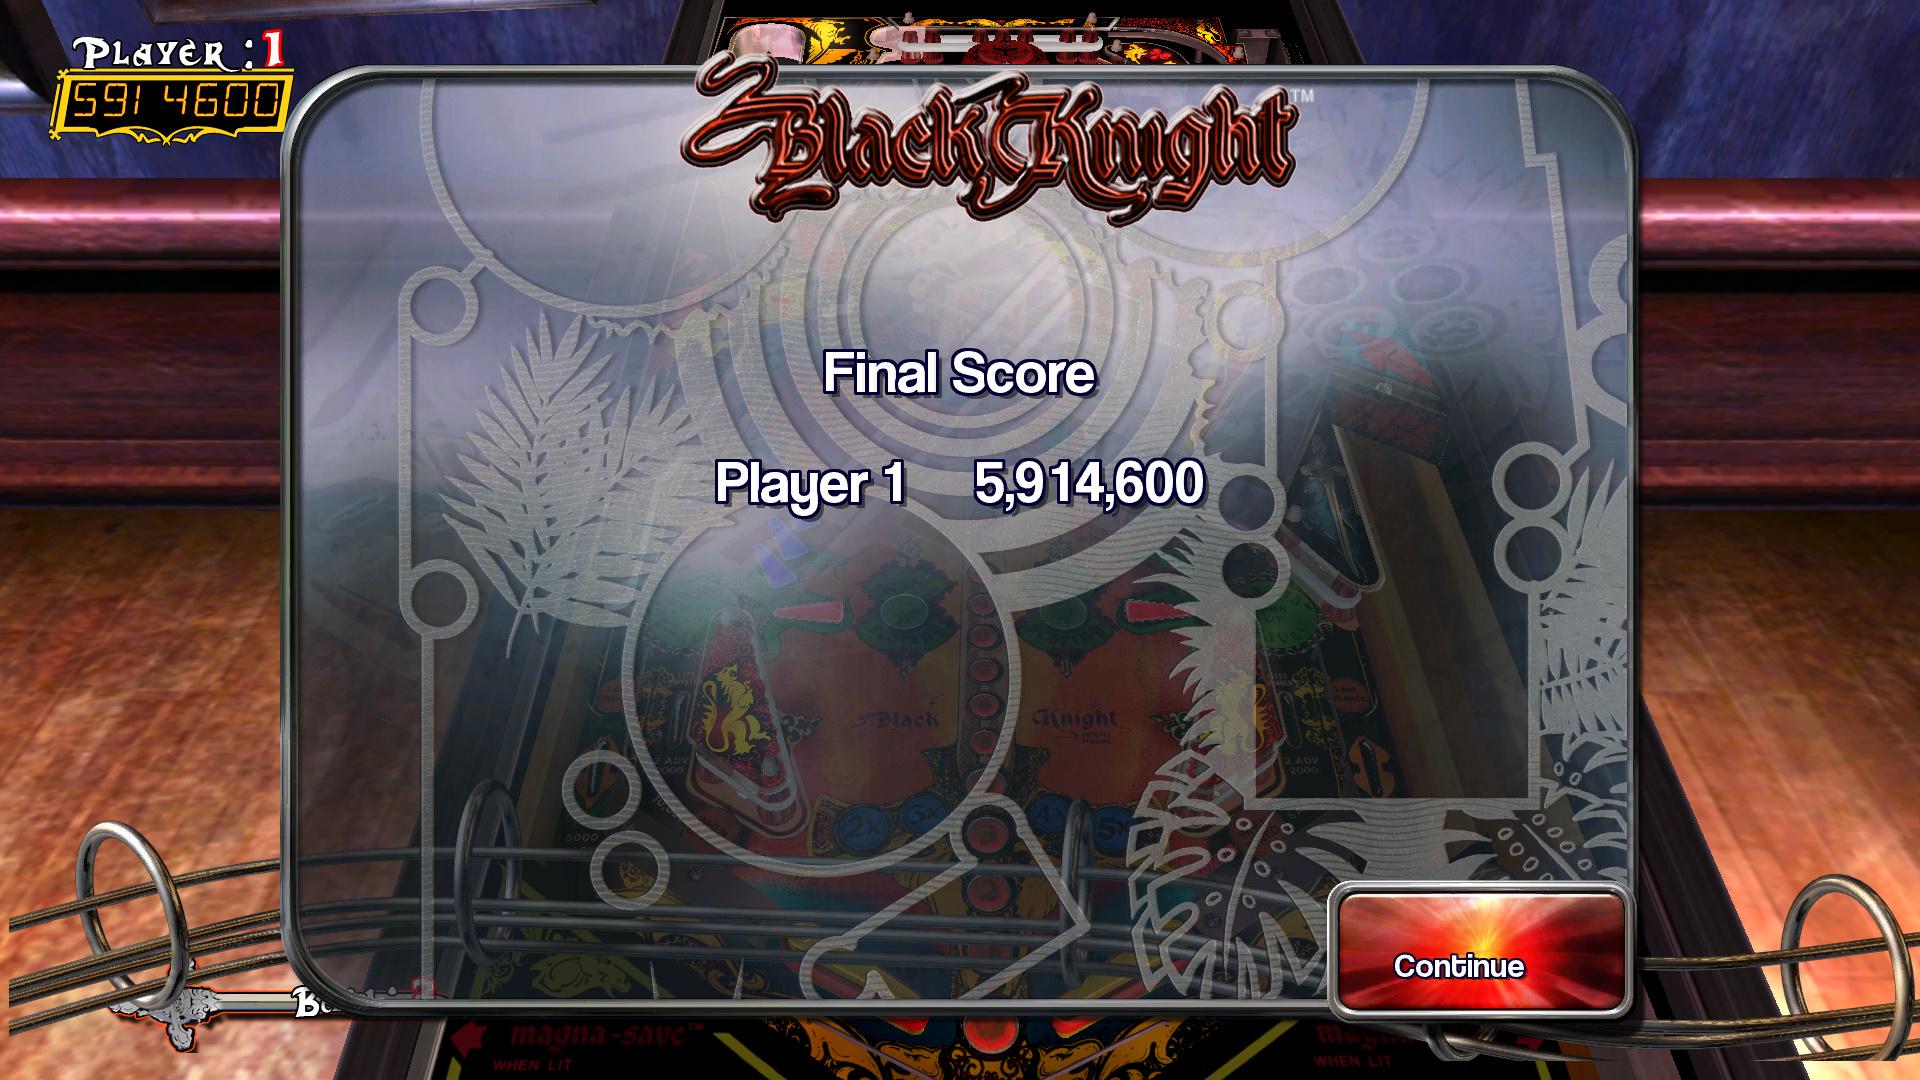 Pinball Arcade: Black Knight 5,914,600 points